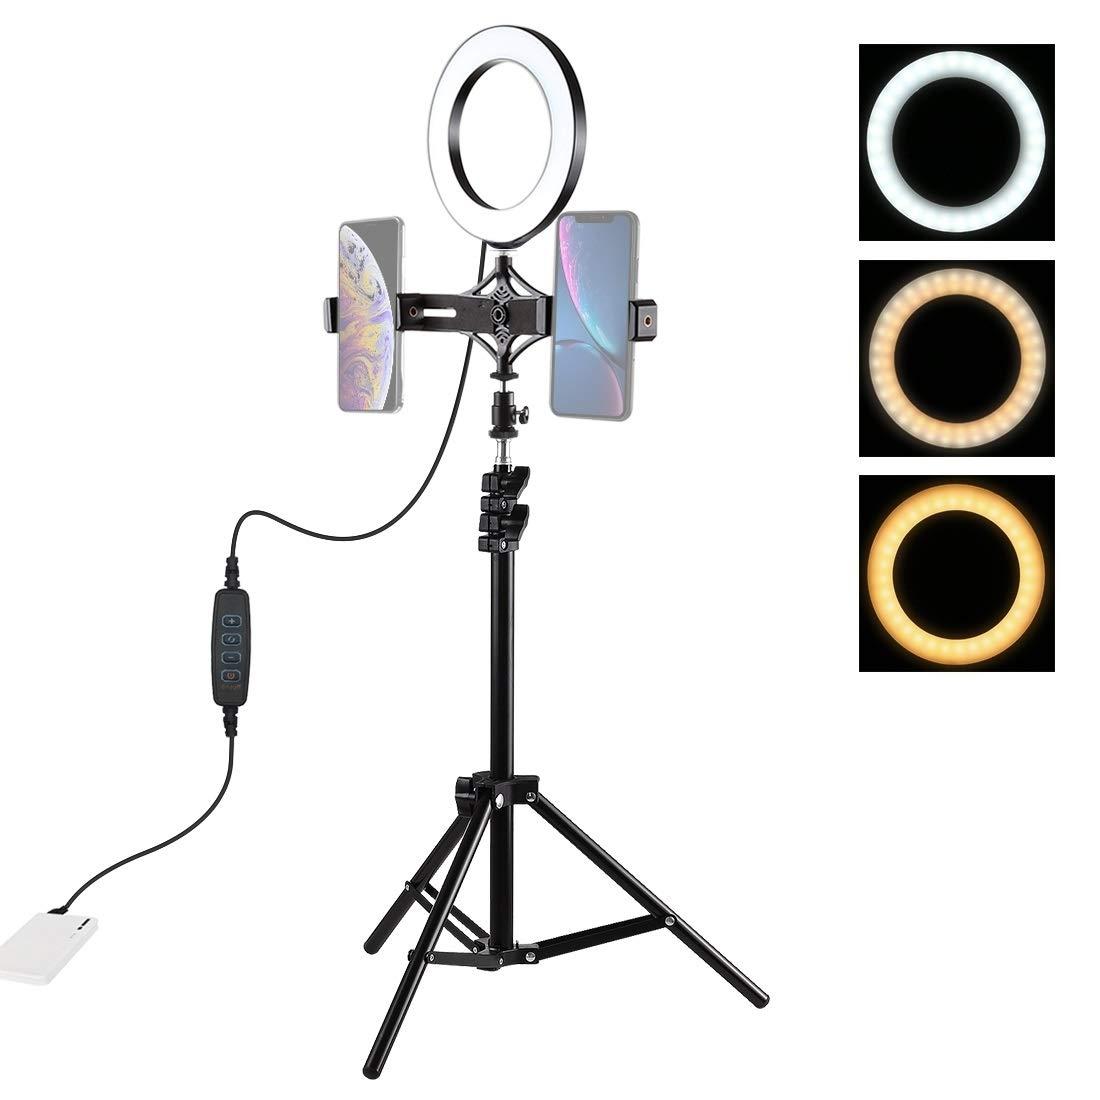 NSK Selfie Ring Light LLP 1.1m Tripod Mount + Live Broadcast Dual Phone Bracket + 6.2 inch LED Ring Vlogging Video Light Kits